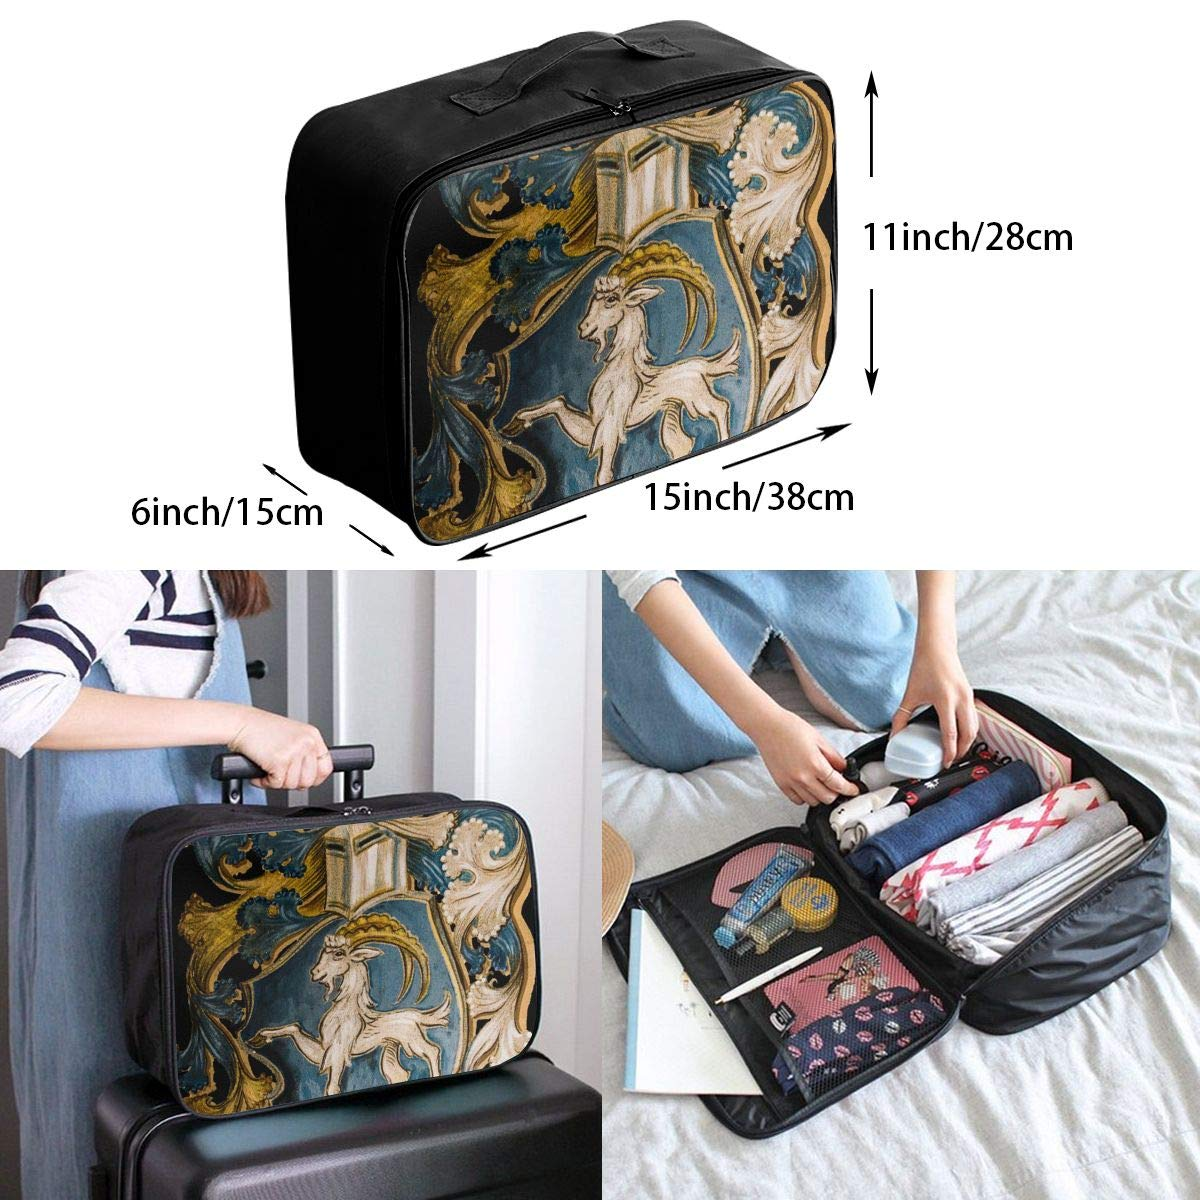 ADGAI Constellation Capricorn Canvas Travel Weekender Bag,Fashion Custom Lightweight Large Capacity Portable Luggage Bag,Suitcase Trolley Bag